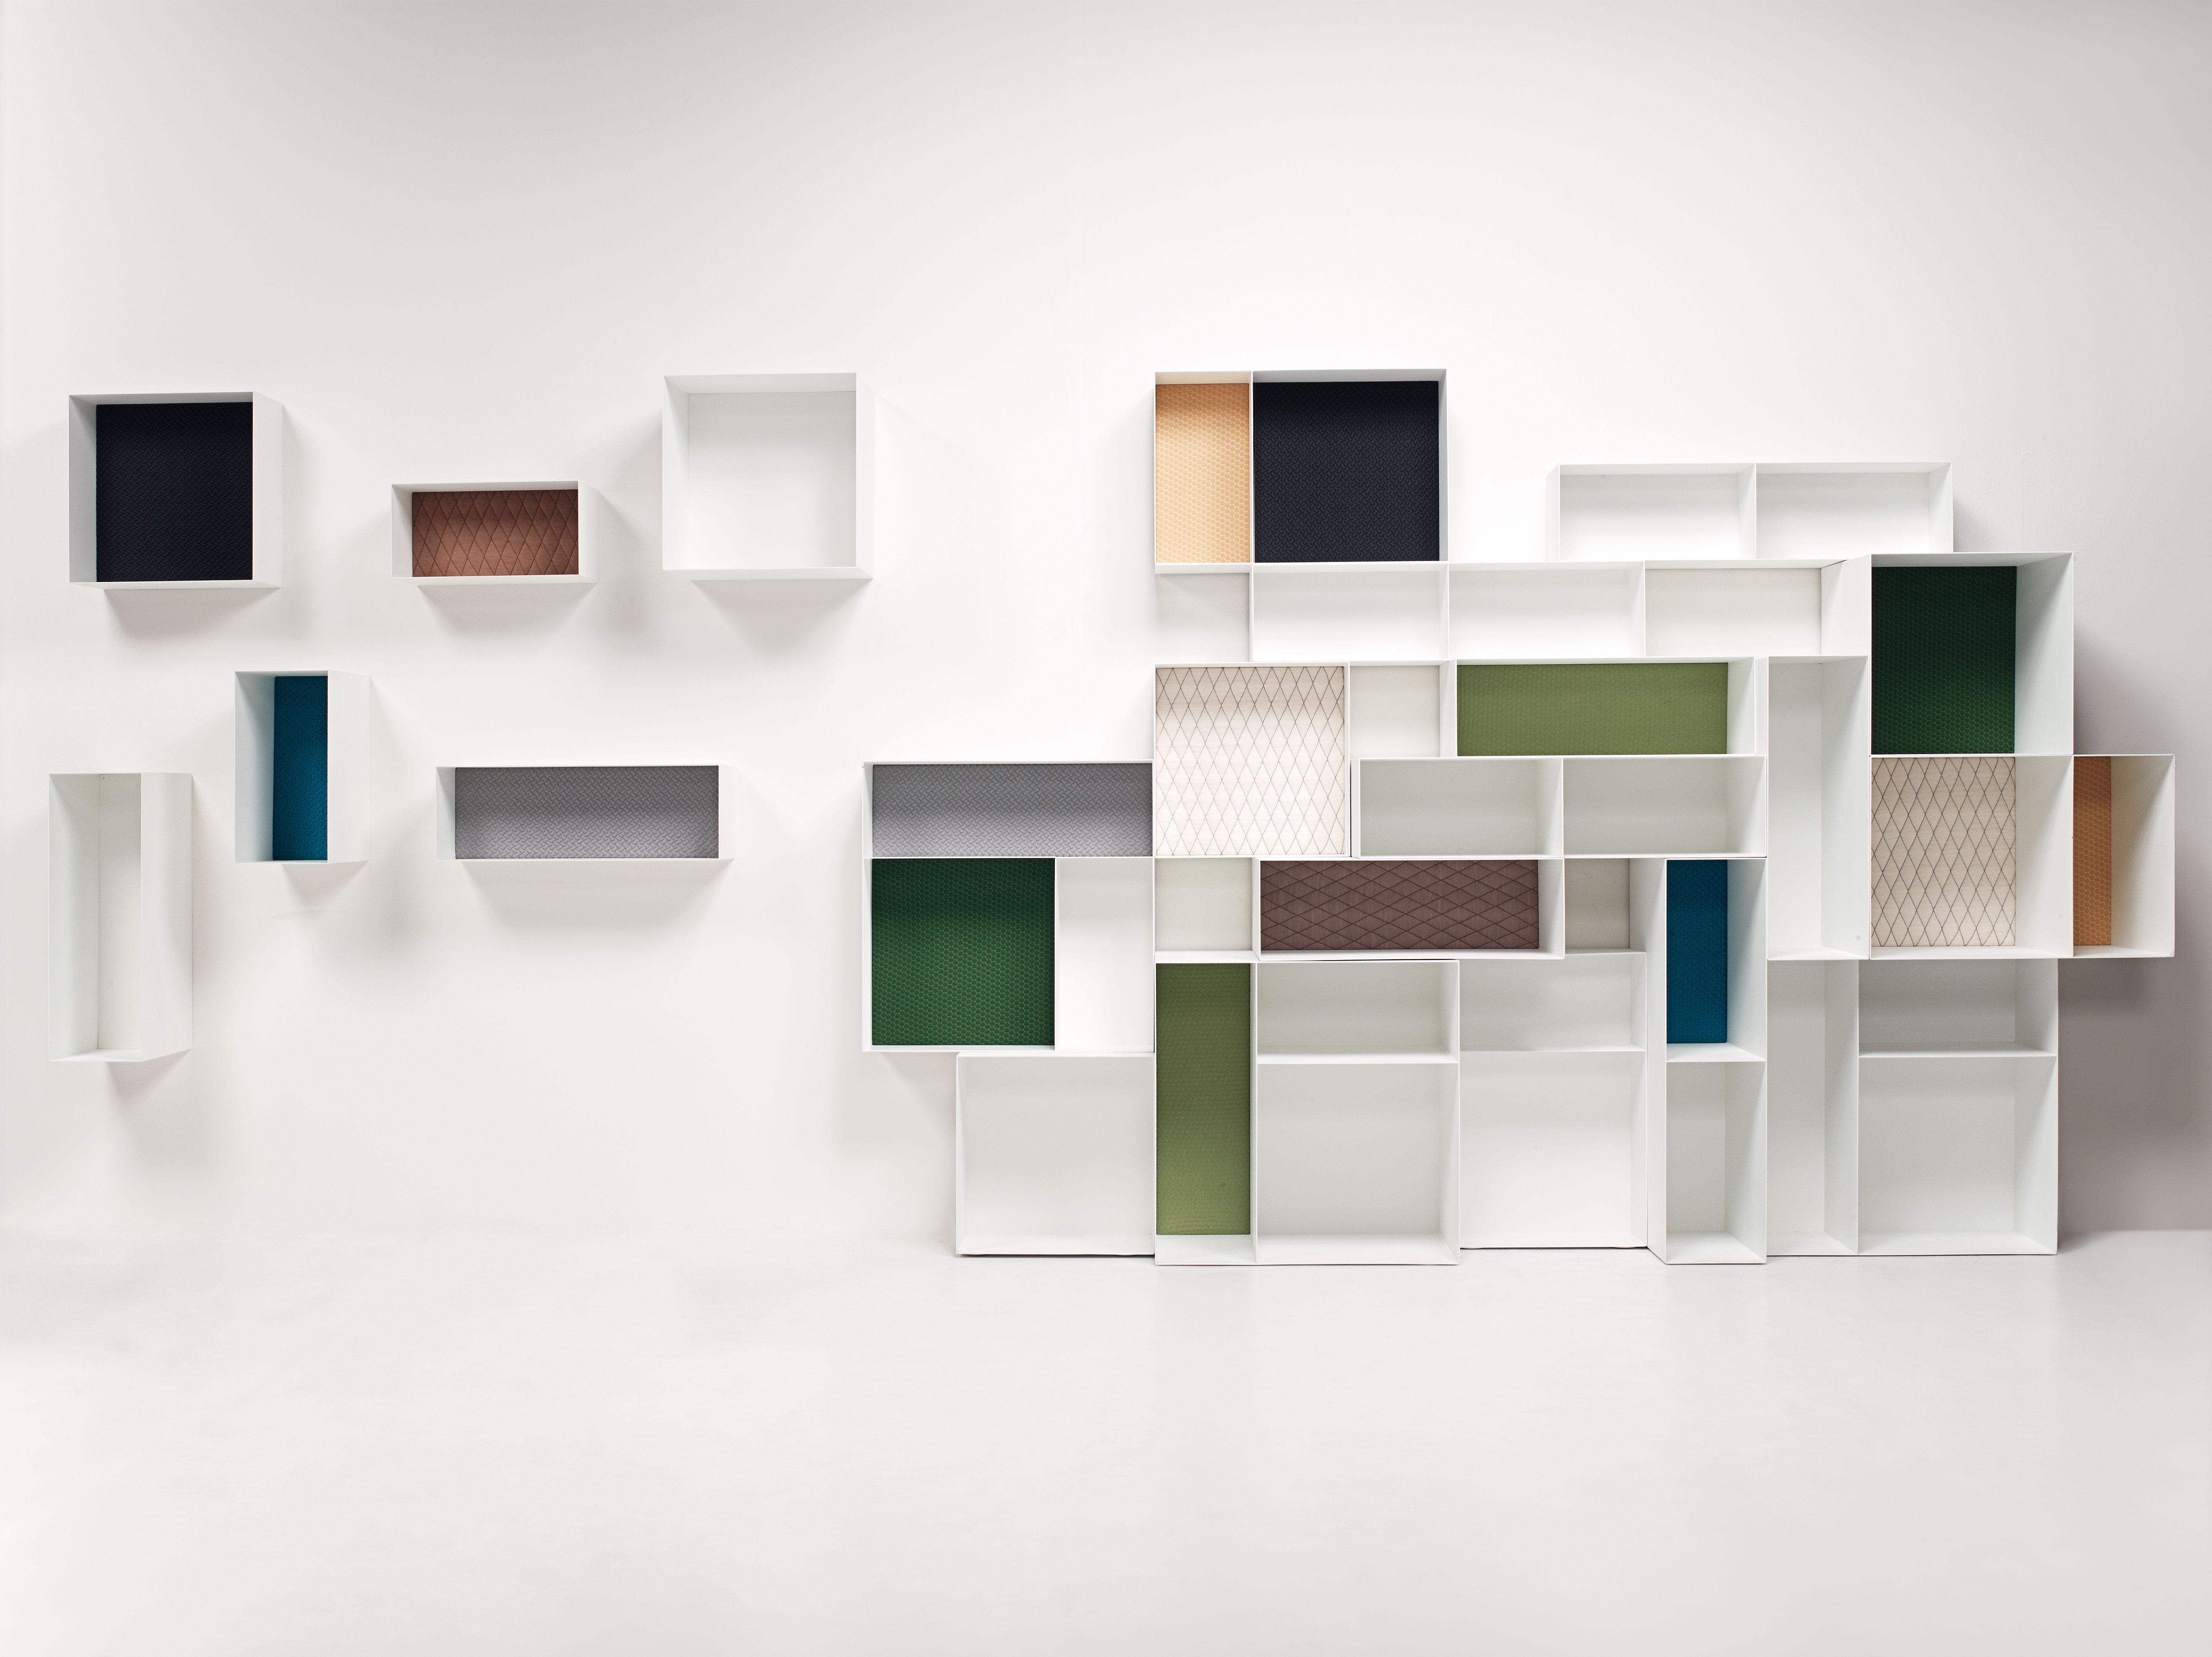 Möbel - Regale und Bücherregale - Alma Regal / Modul 60 x 20 cm - T 30 cm - Rückwand lackiert - Casamania - 60 x 20 cm - weiß / Rückwand beige - lackiertes Metall